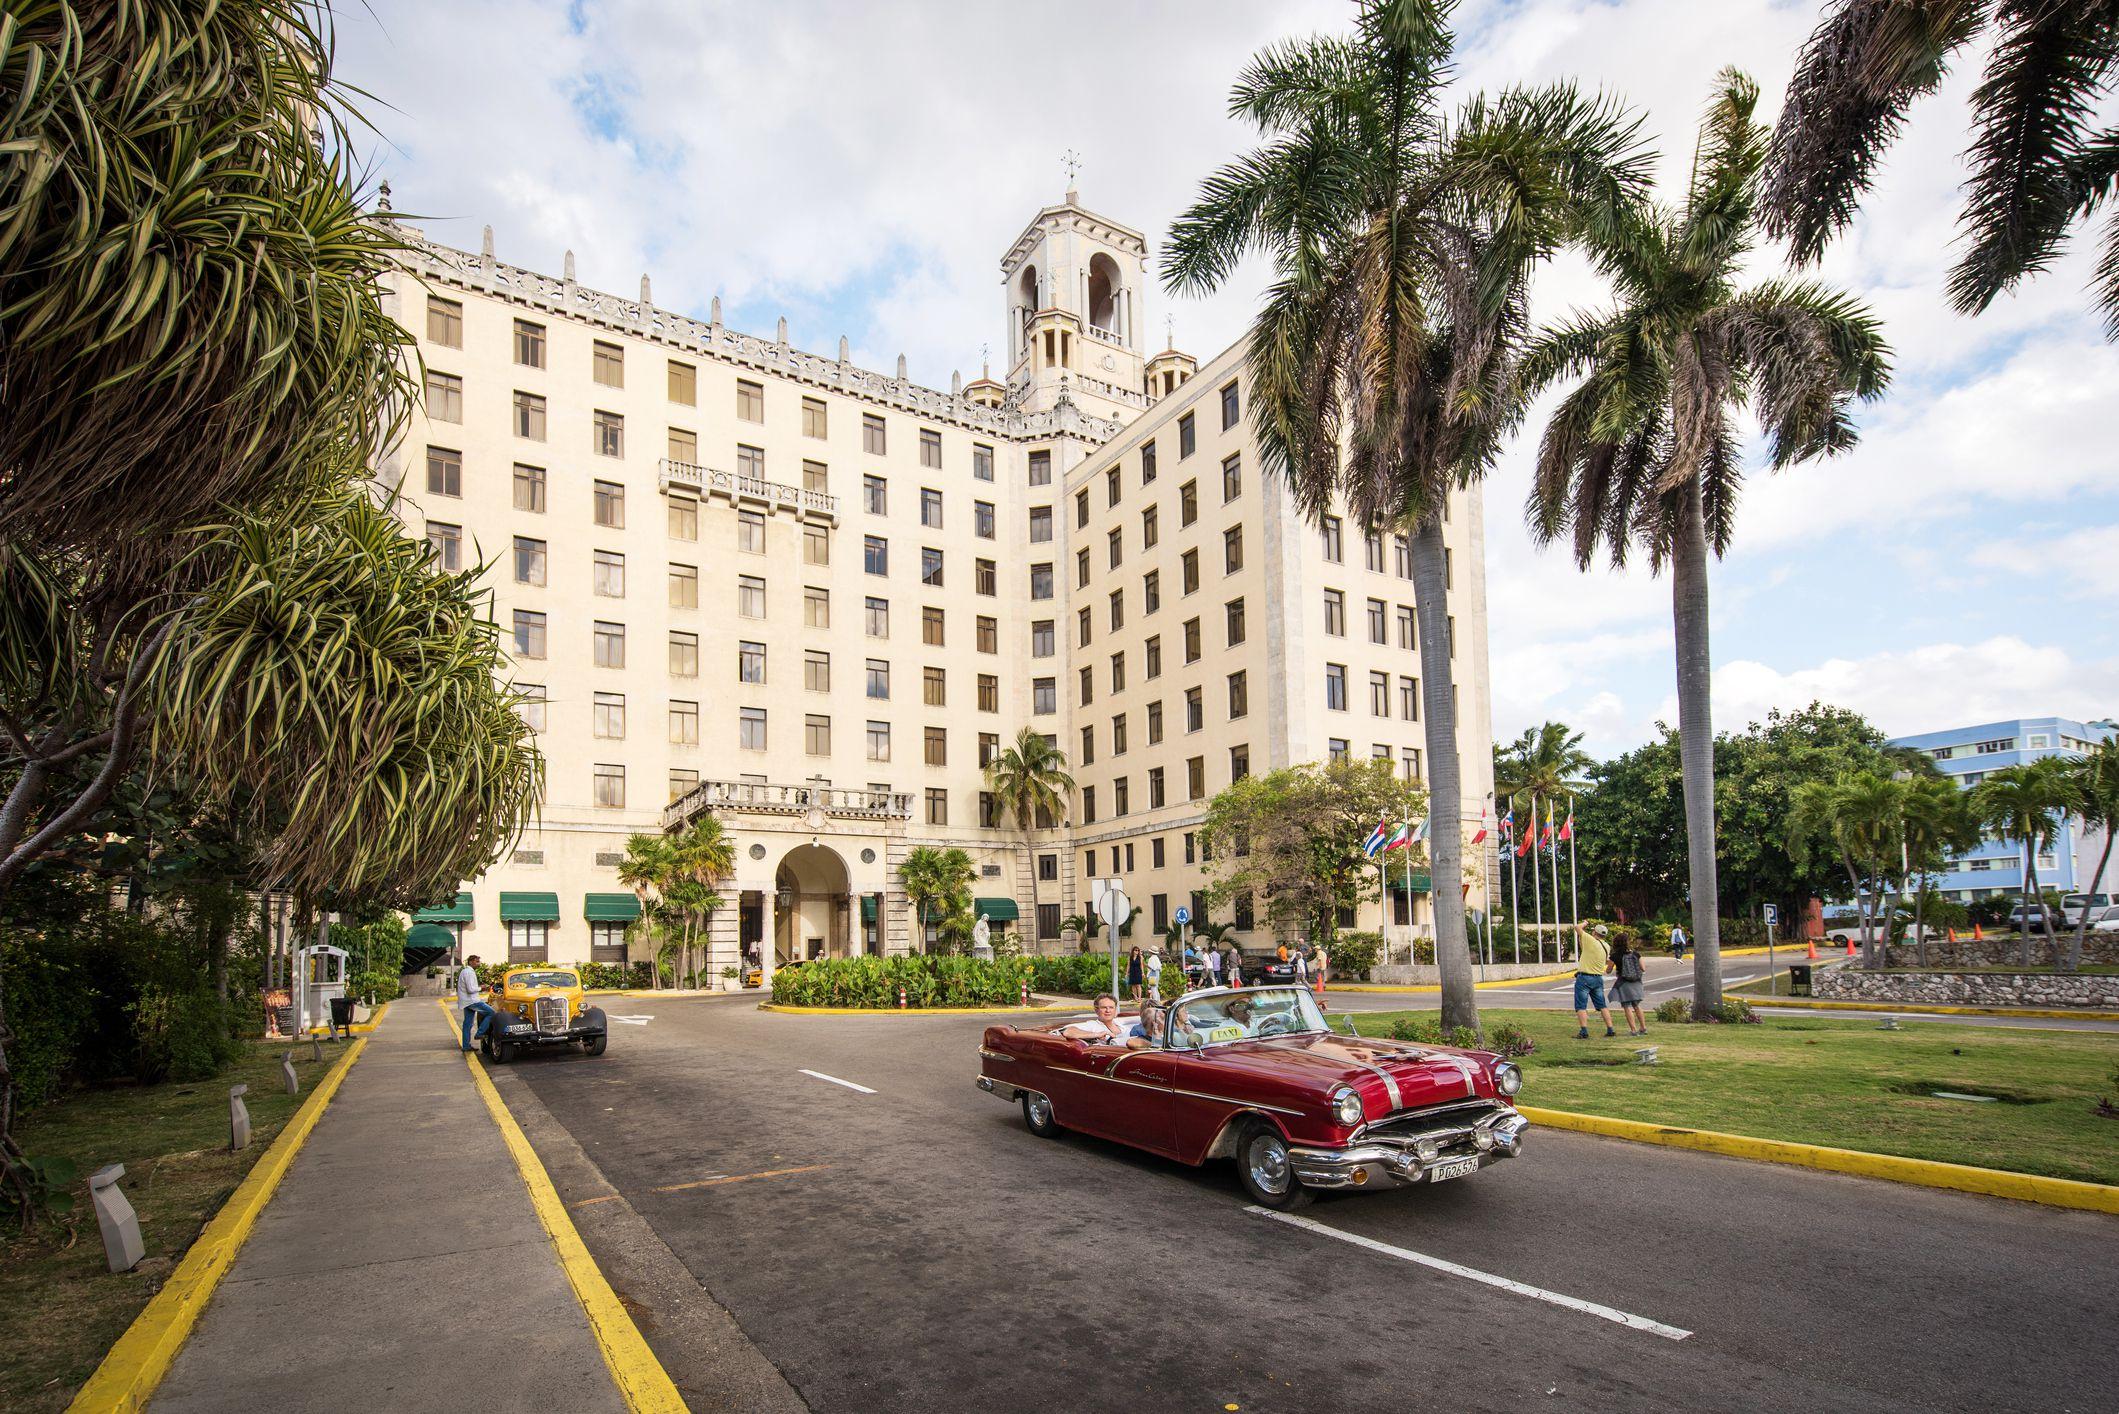 Vintage convertible car in front of hotel nacional in Havana, Cuba